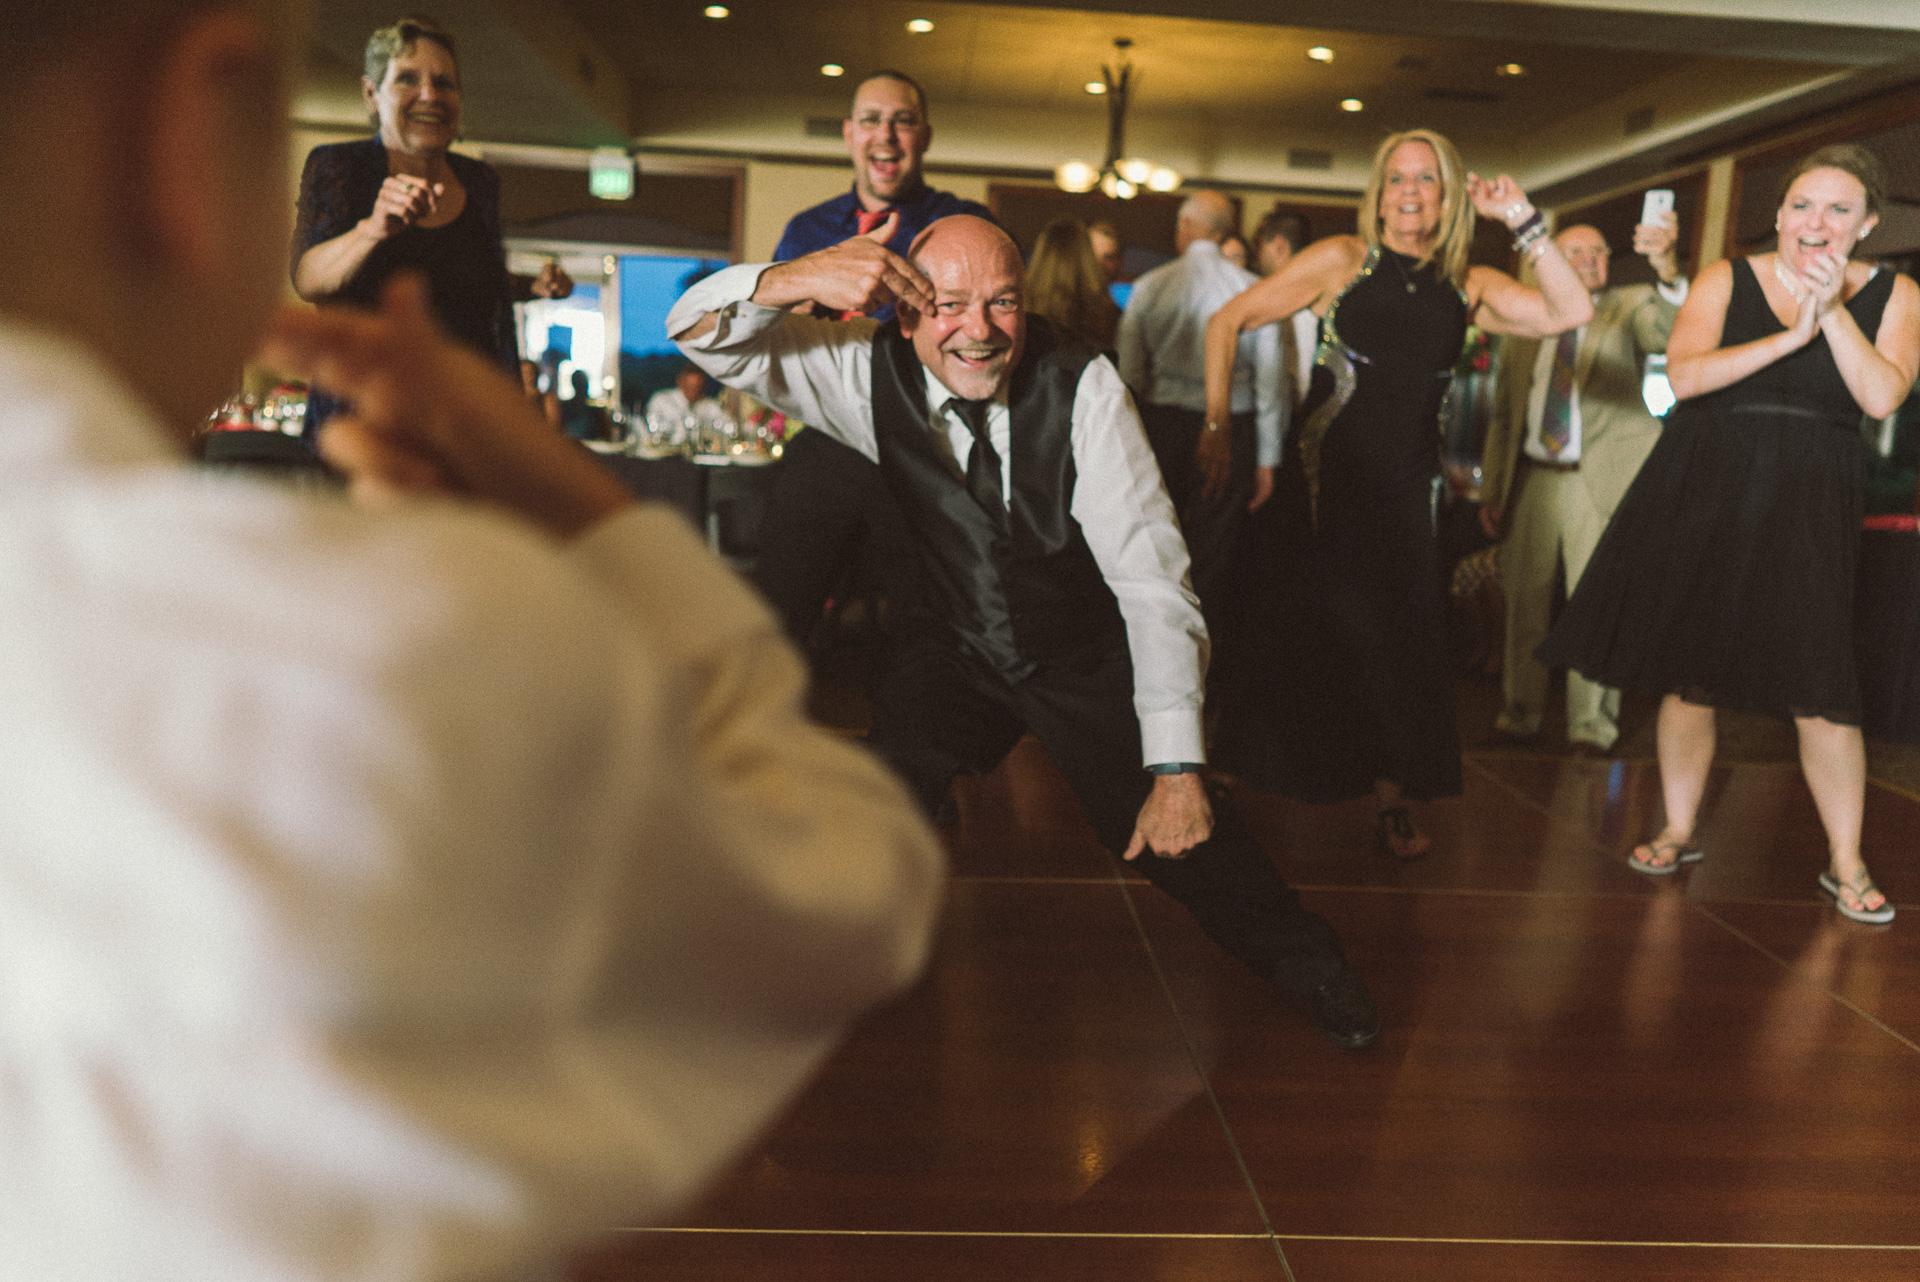 Dayton Wedding Photographer - Father of Groom